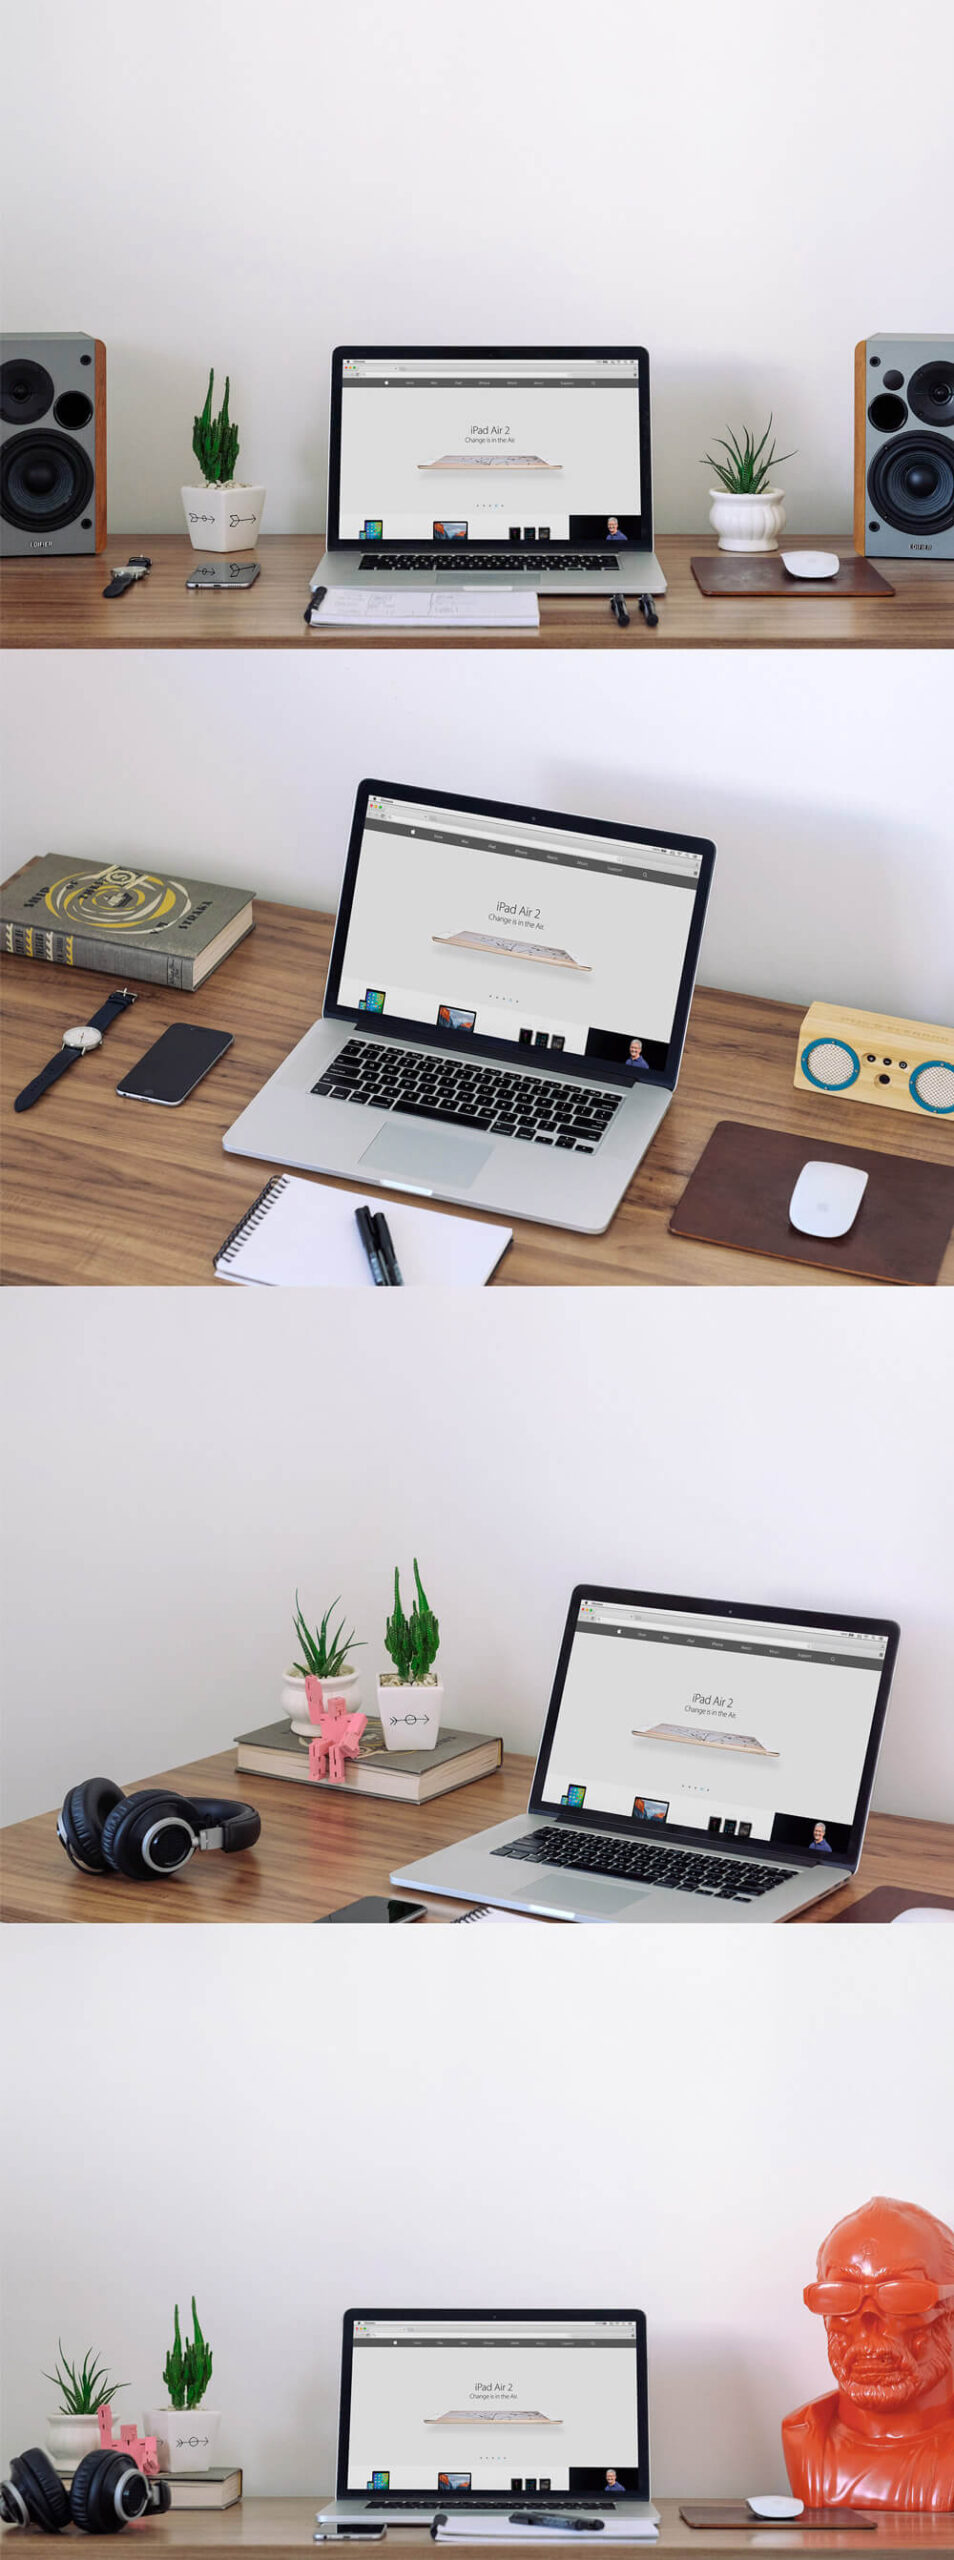 Free Macbook Workspace Mockup PSD Template1 (1)